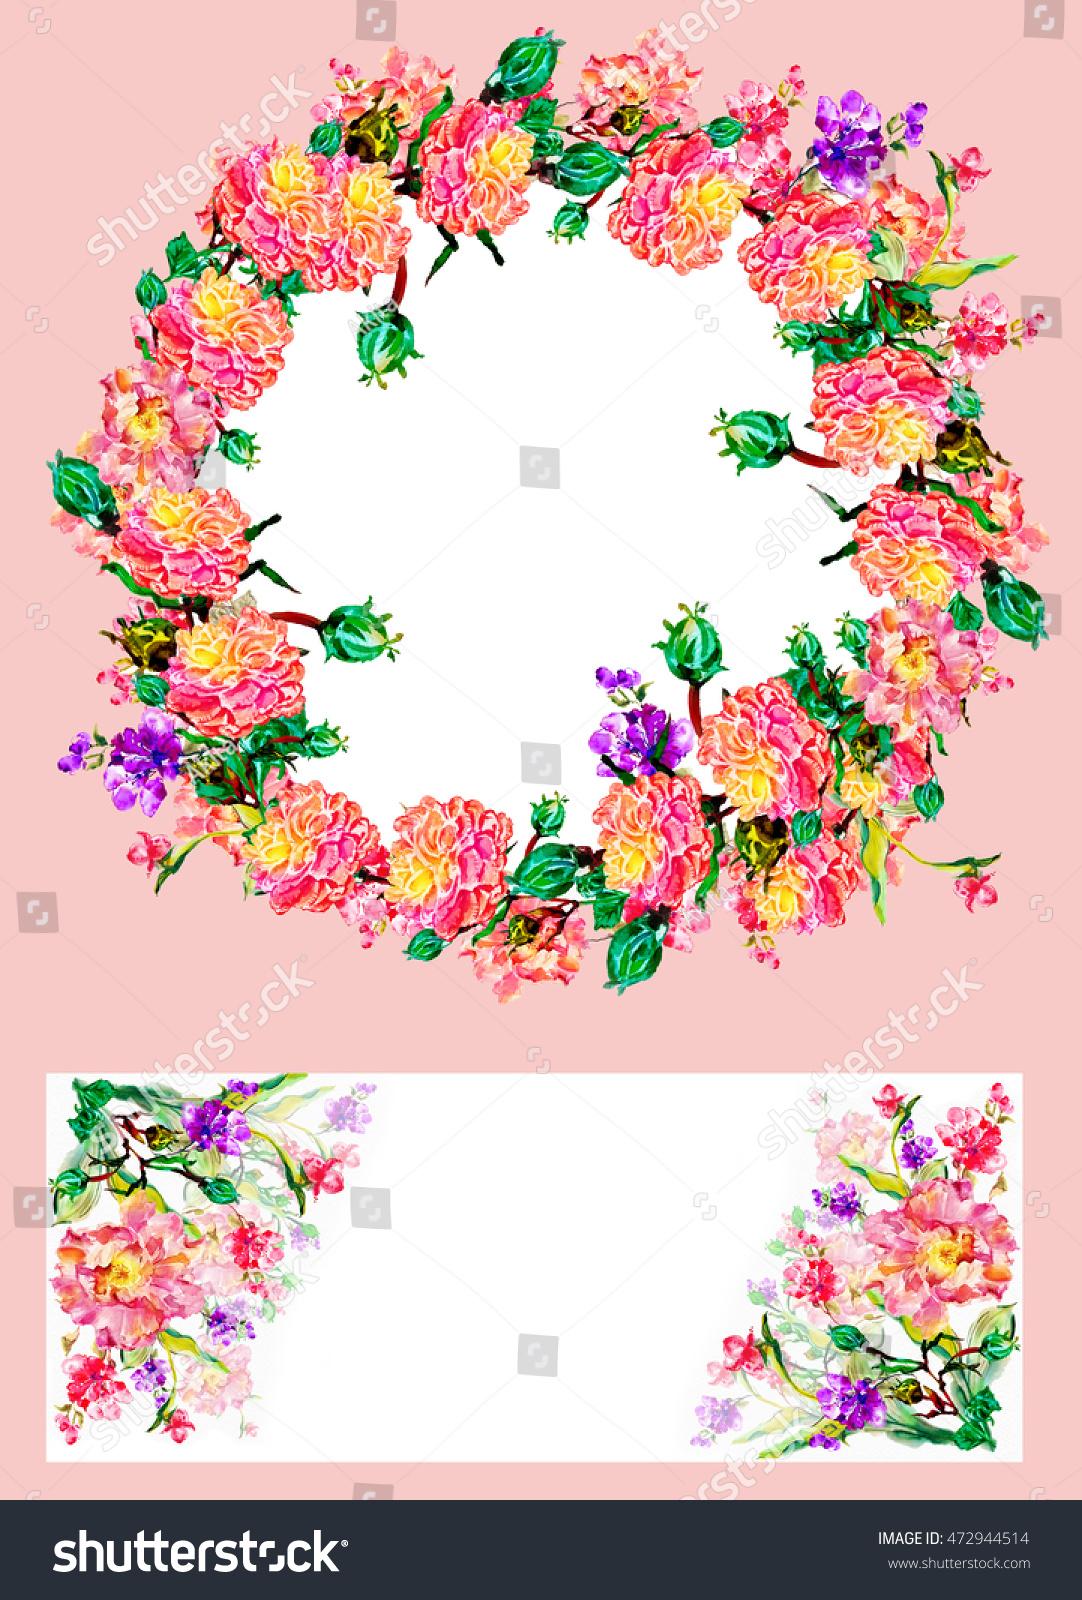 Flower Watercolor Background Floral Illustration Set Stock